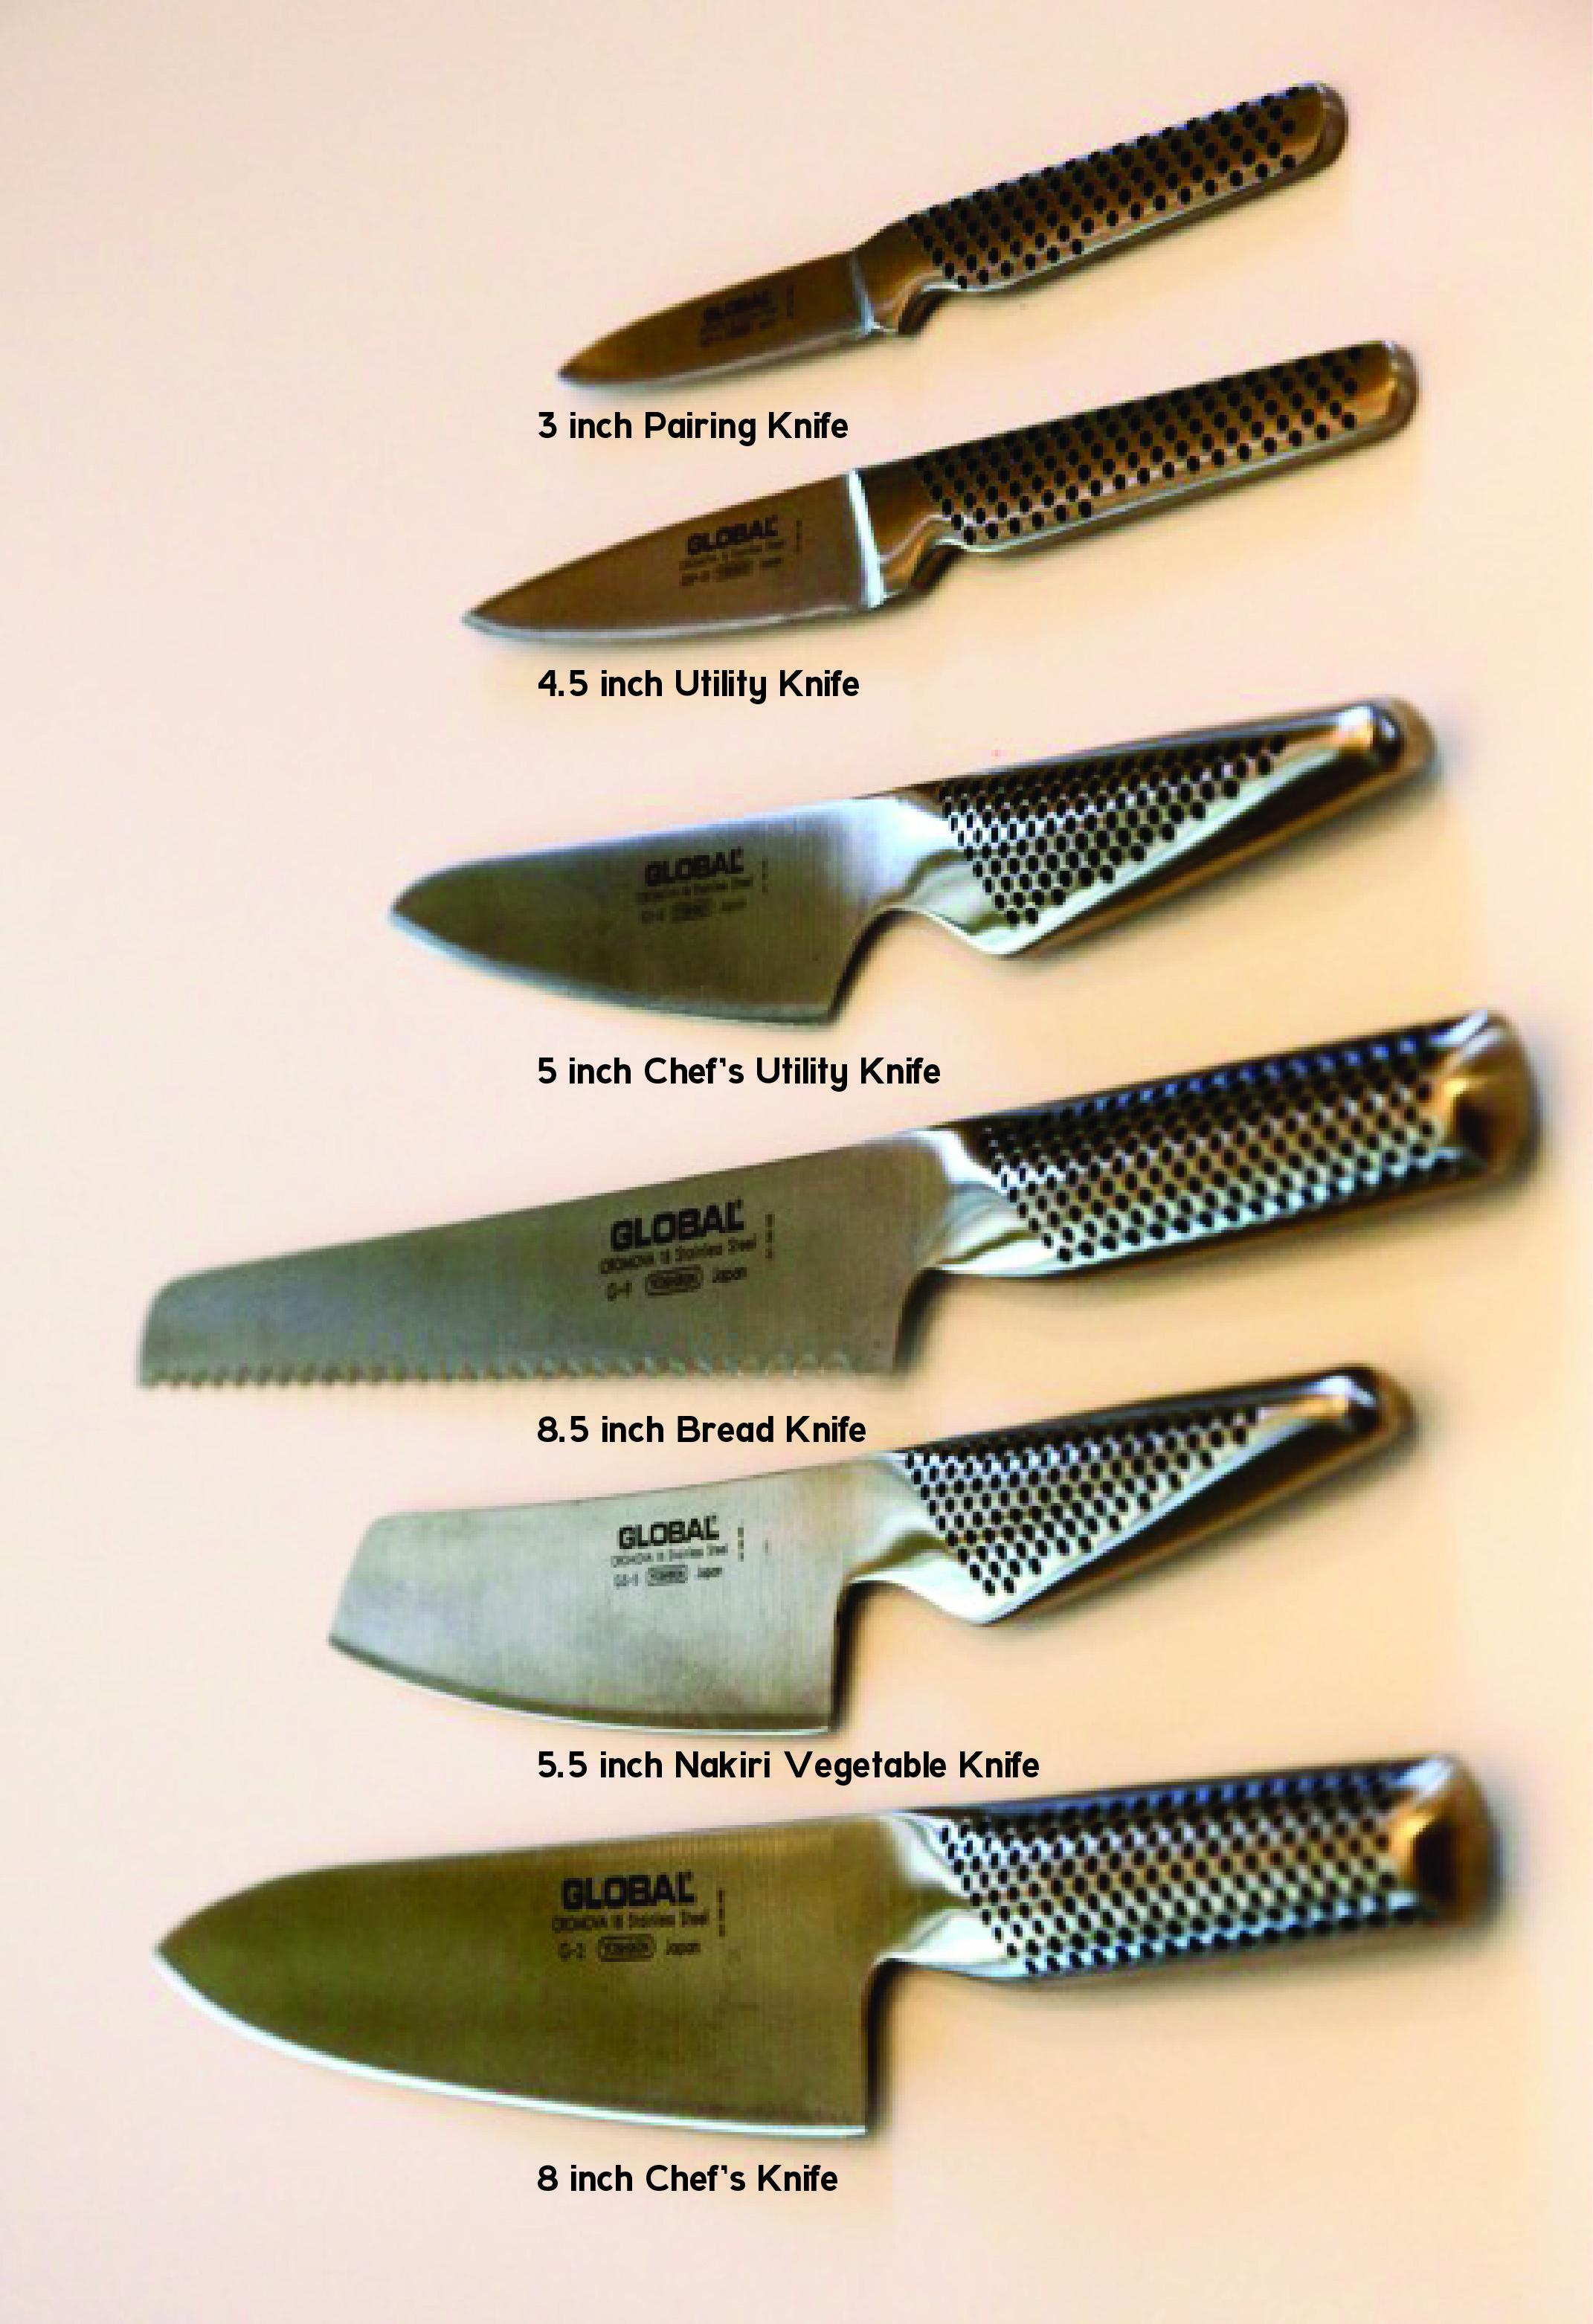 100 Global Kitchen Knives Global Kitchen Shears Glb Gks 210 Williams Food Equipment